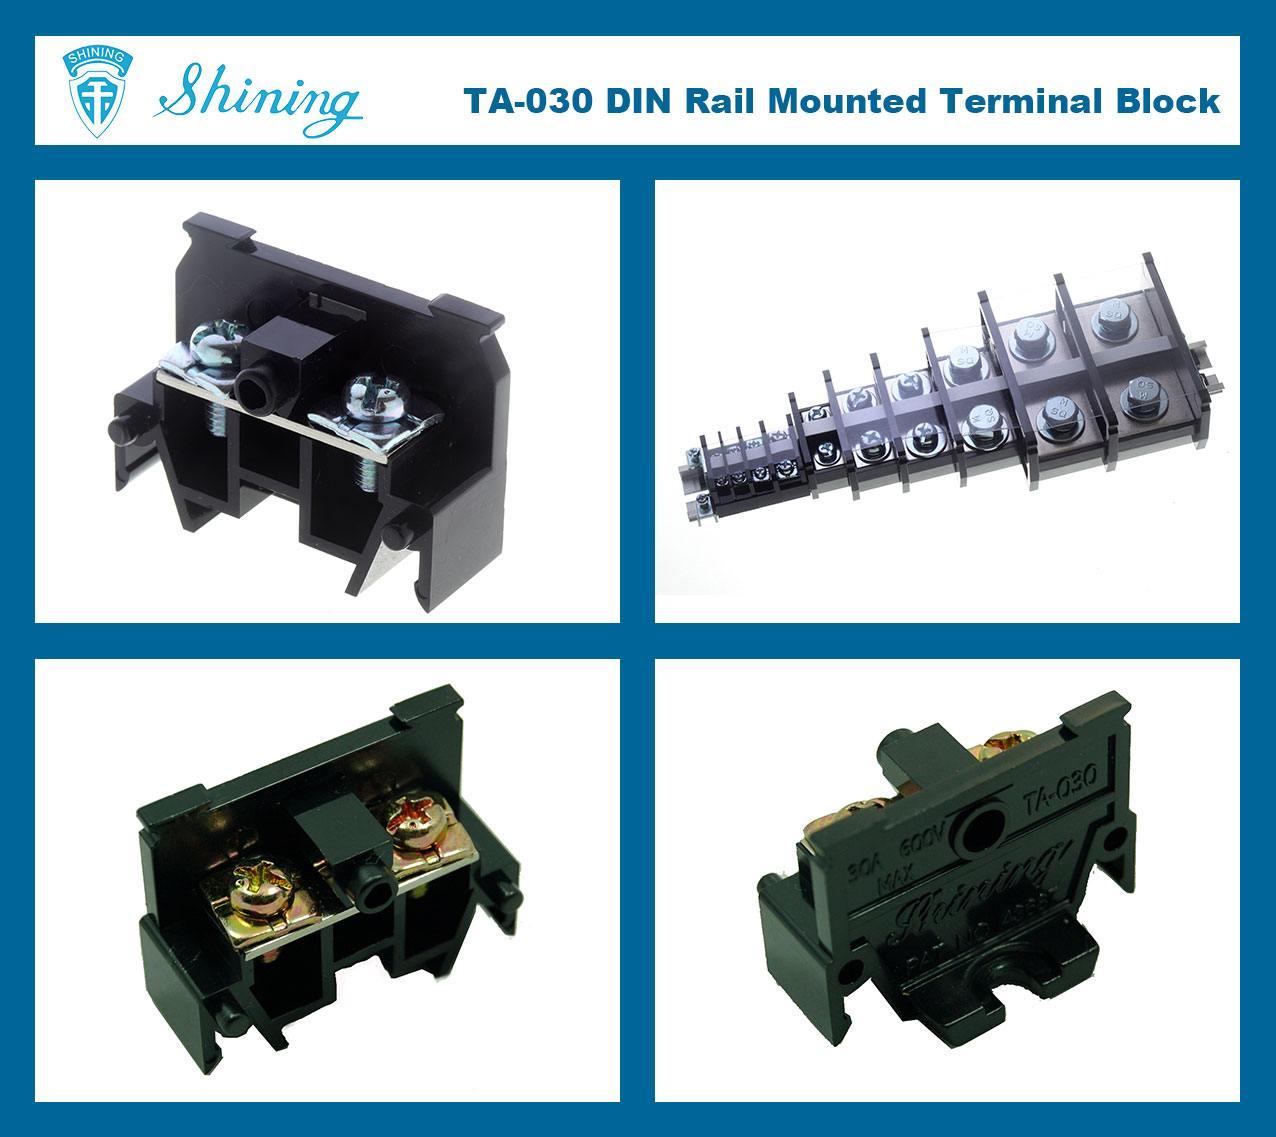 SHINING-TA-030 35mm-Din-Rail-Mounted-Assembly-Type-600V-30A-Terminal-Block